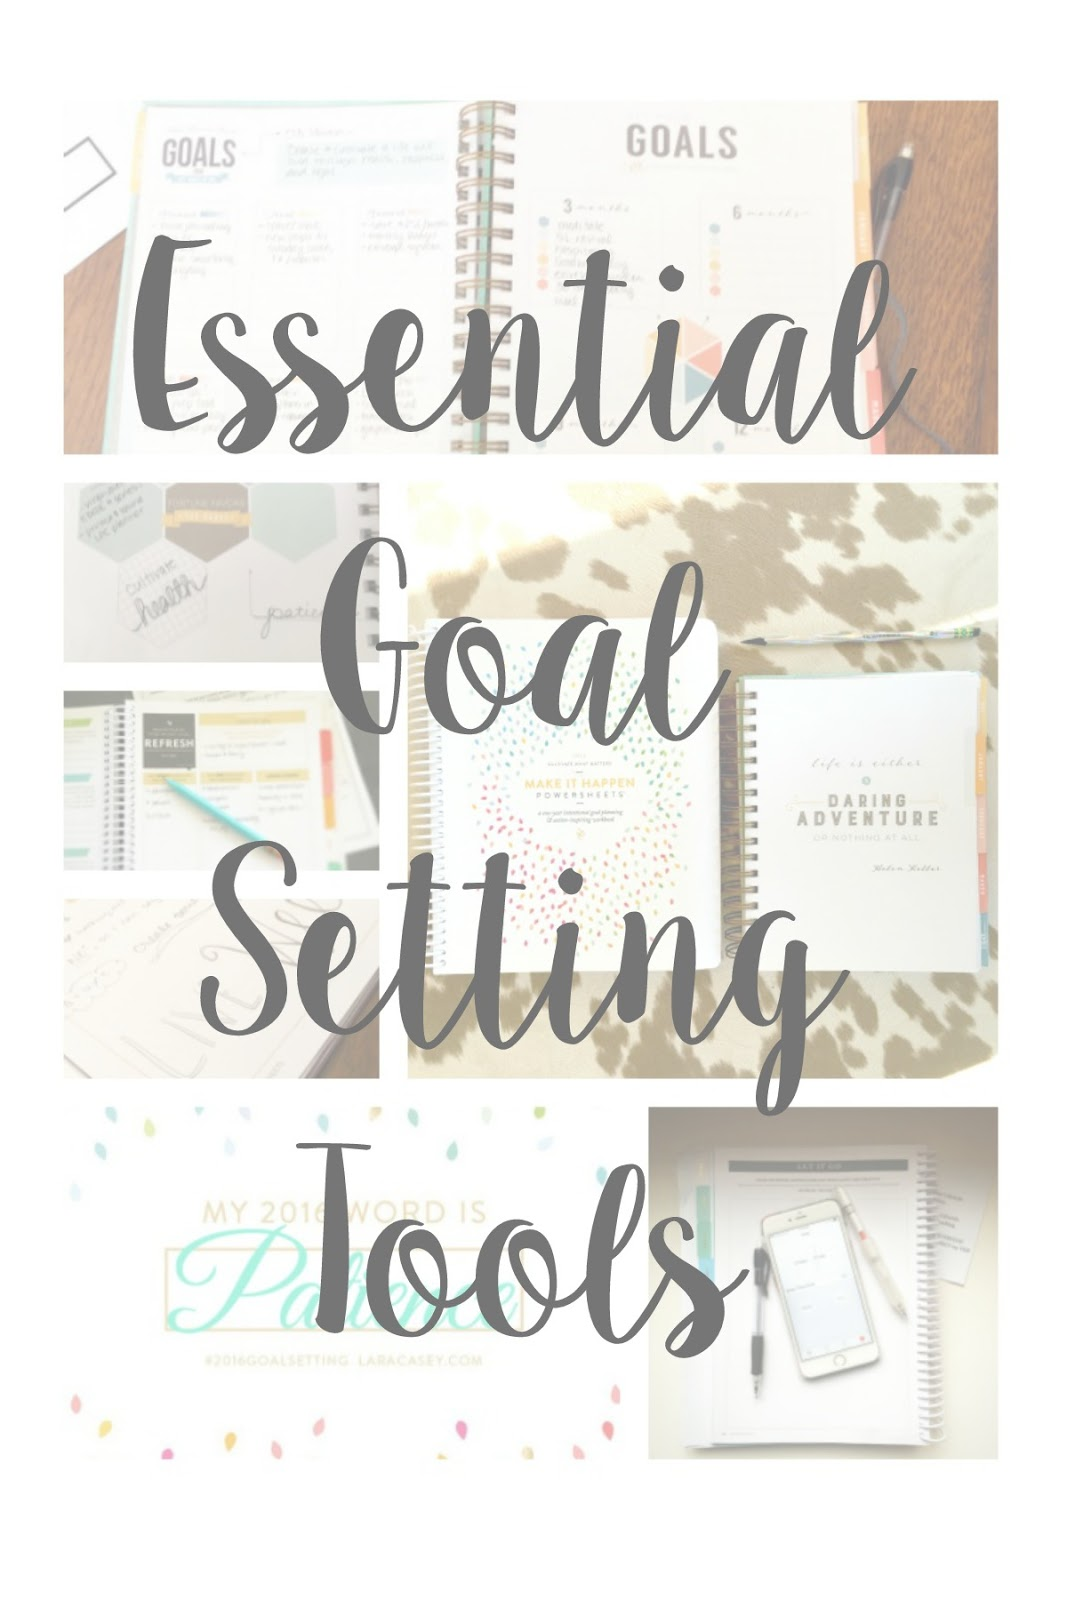 Sweetpea Lifestyle Essential Goal Planning Tools